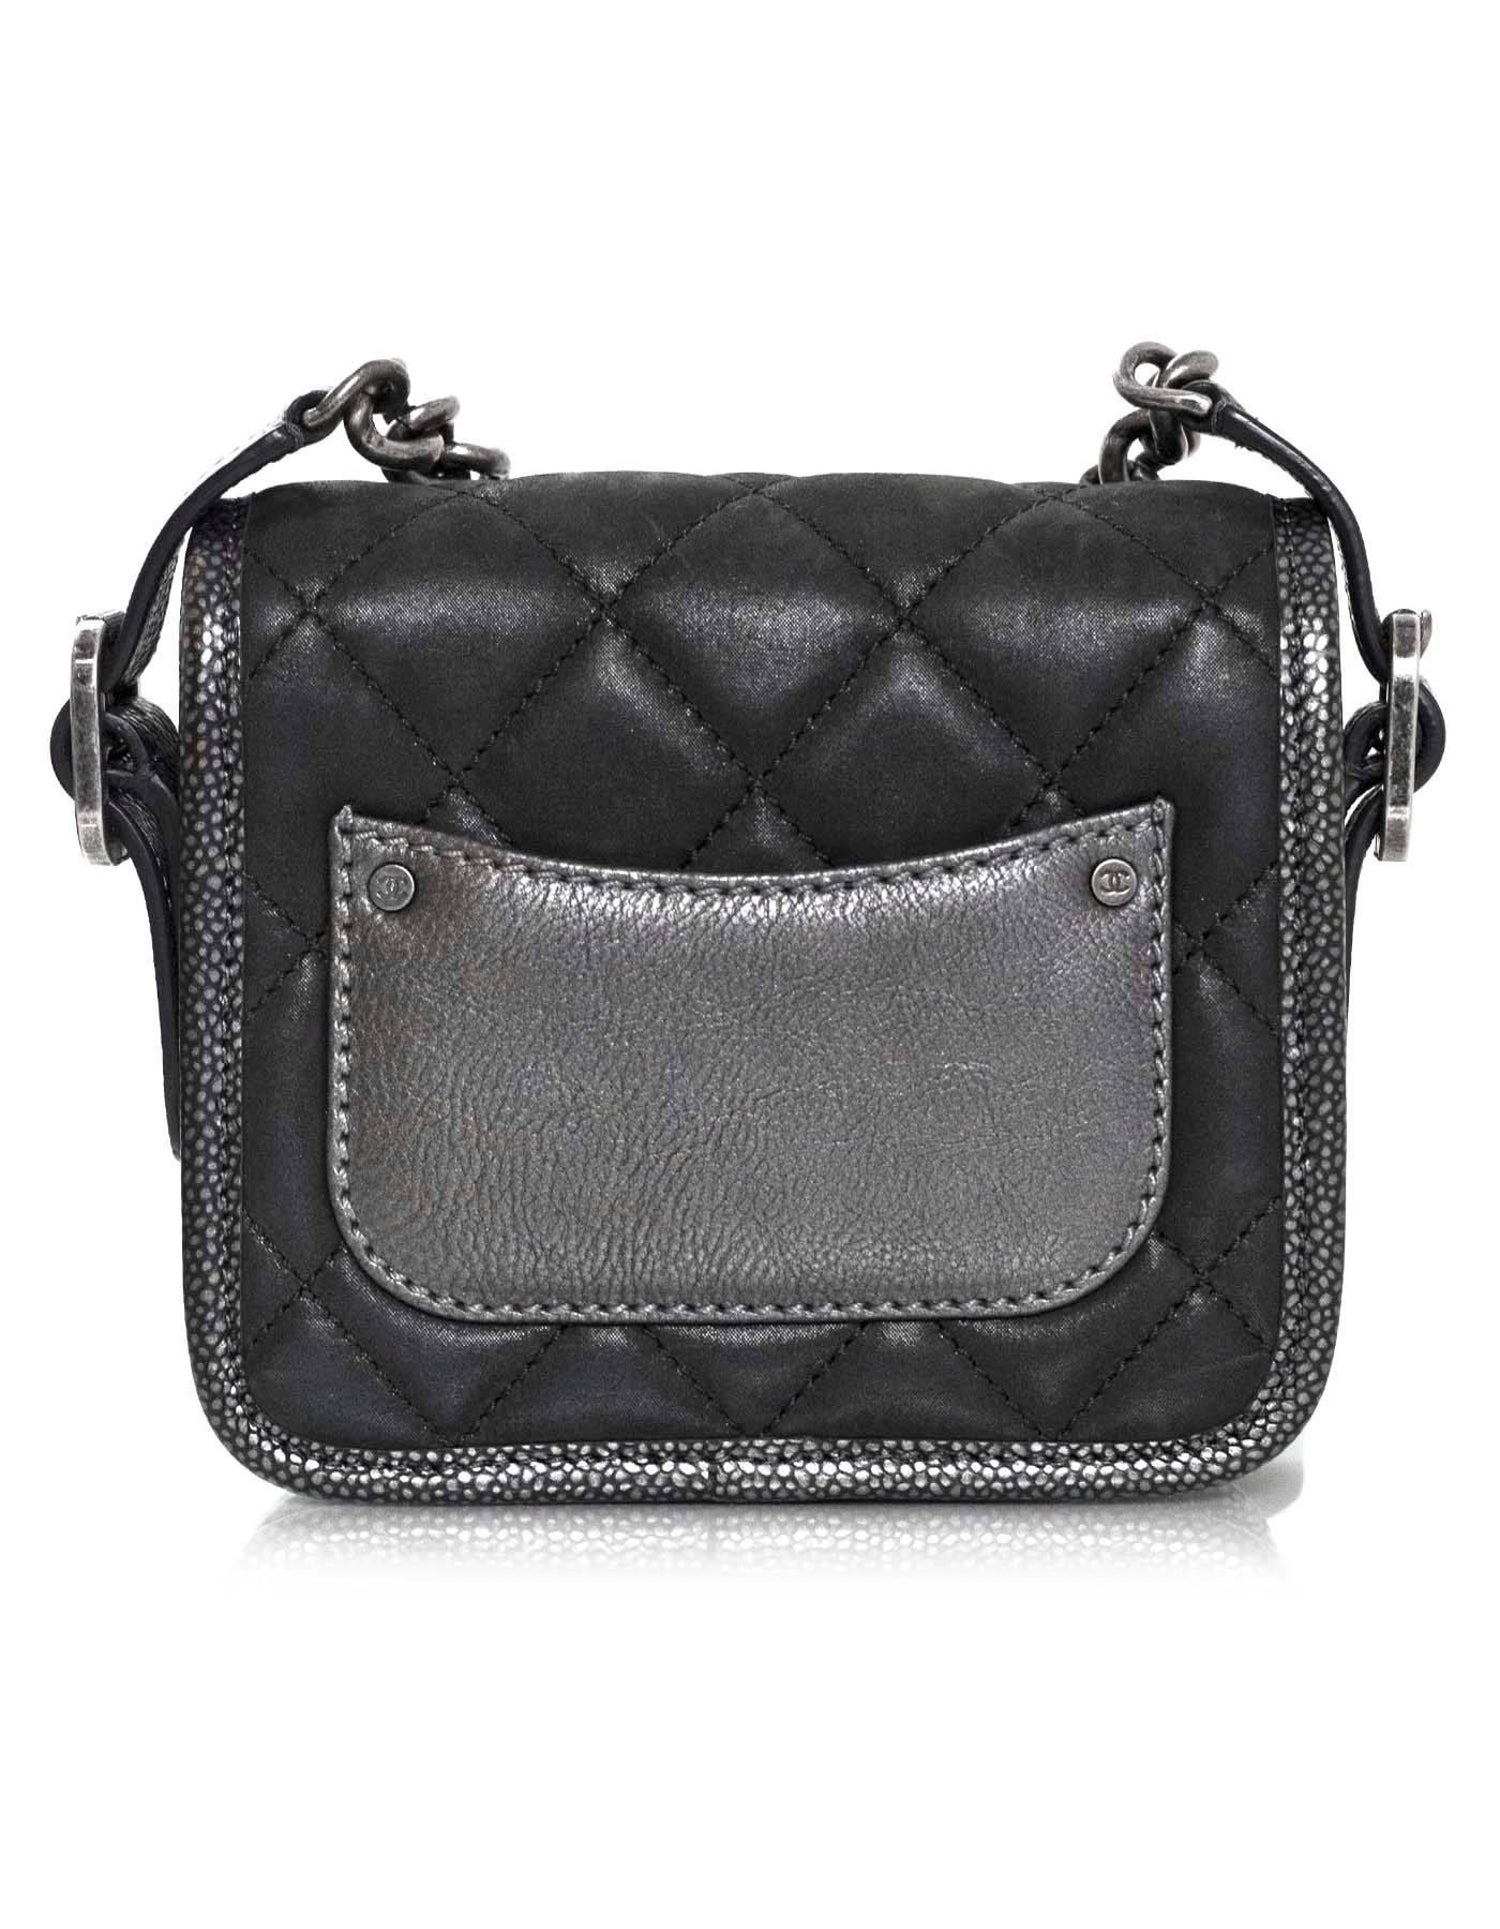 43db8ca63c06 Chanel Grey Iridescent Paris/Bombay Back to School Mini Flap Crossbody Bag  For Sale at 1stdibs